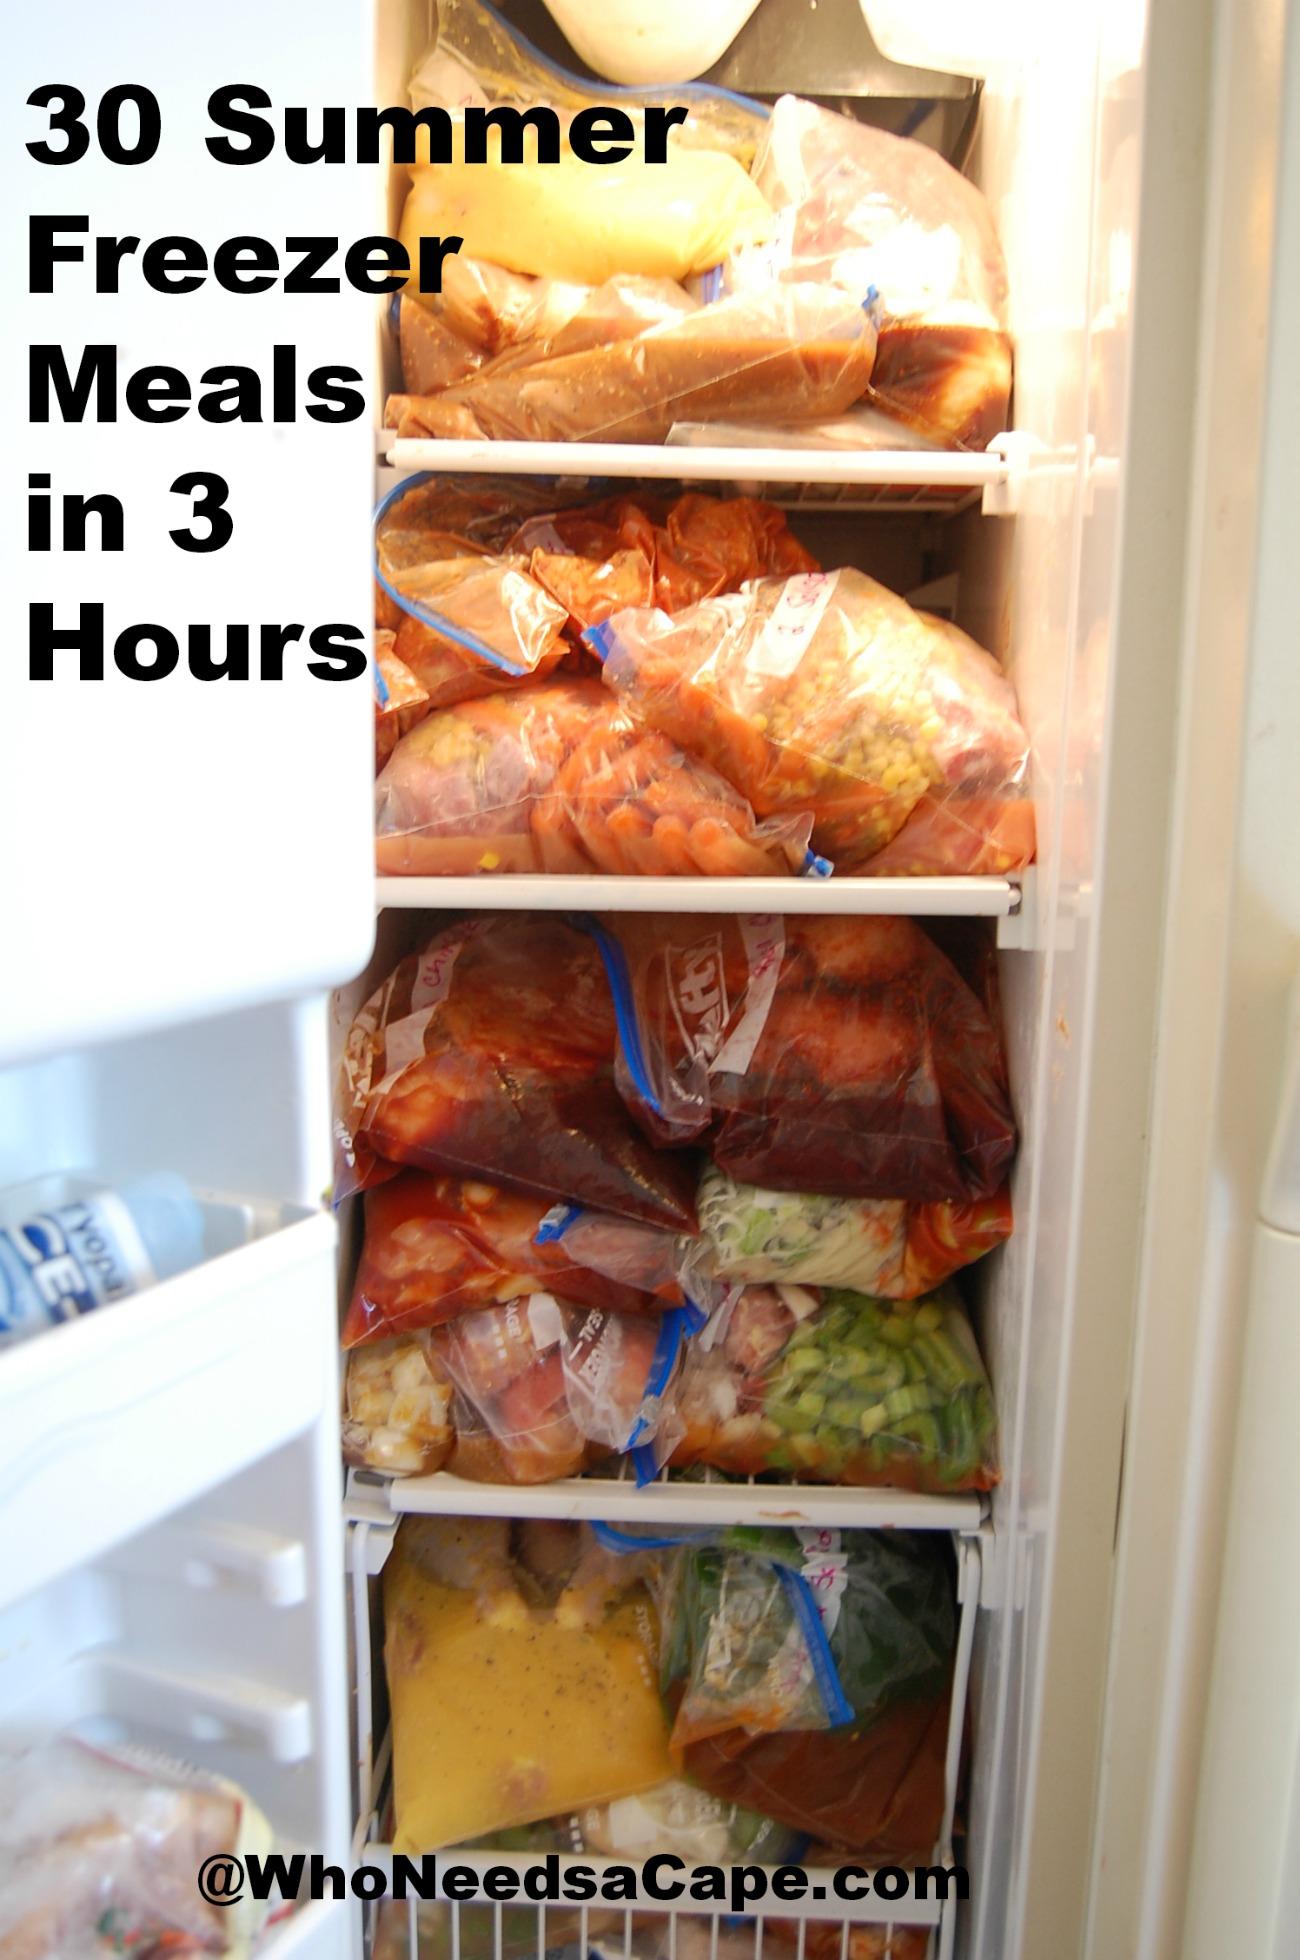 how to make freeze meals